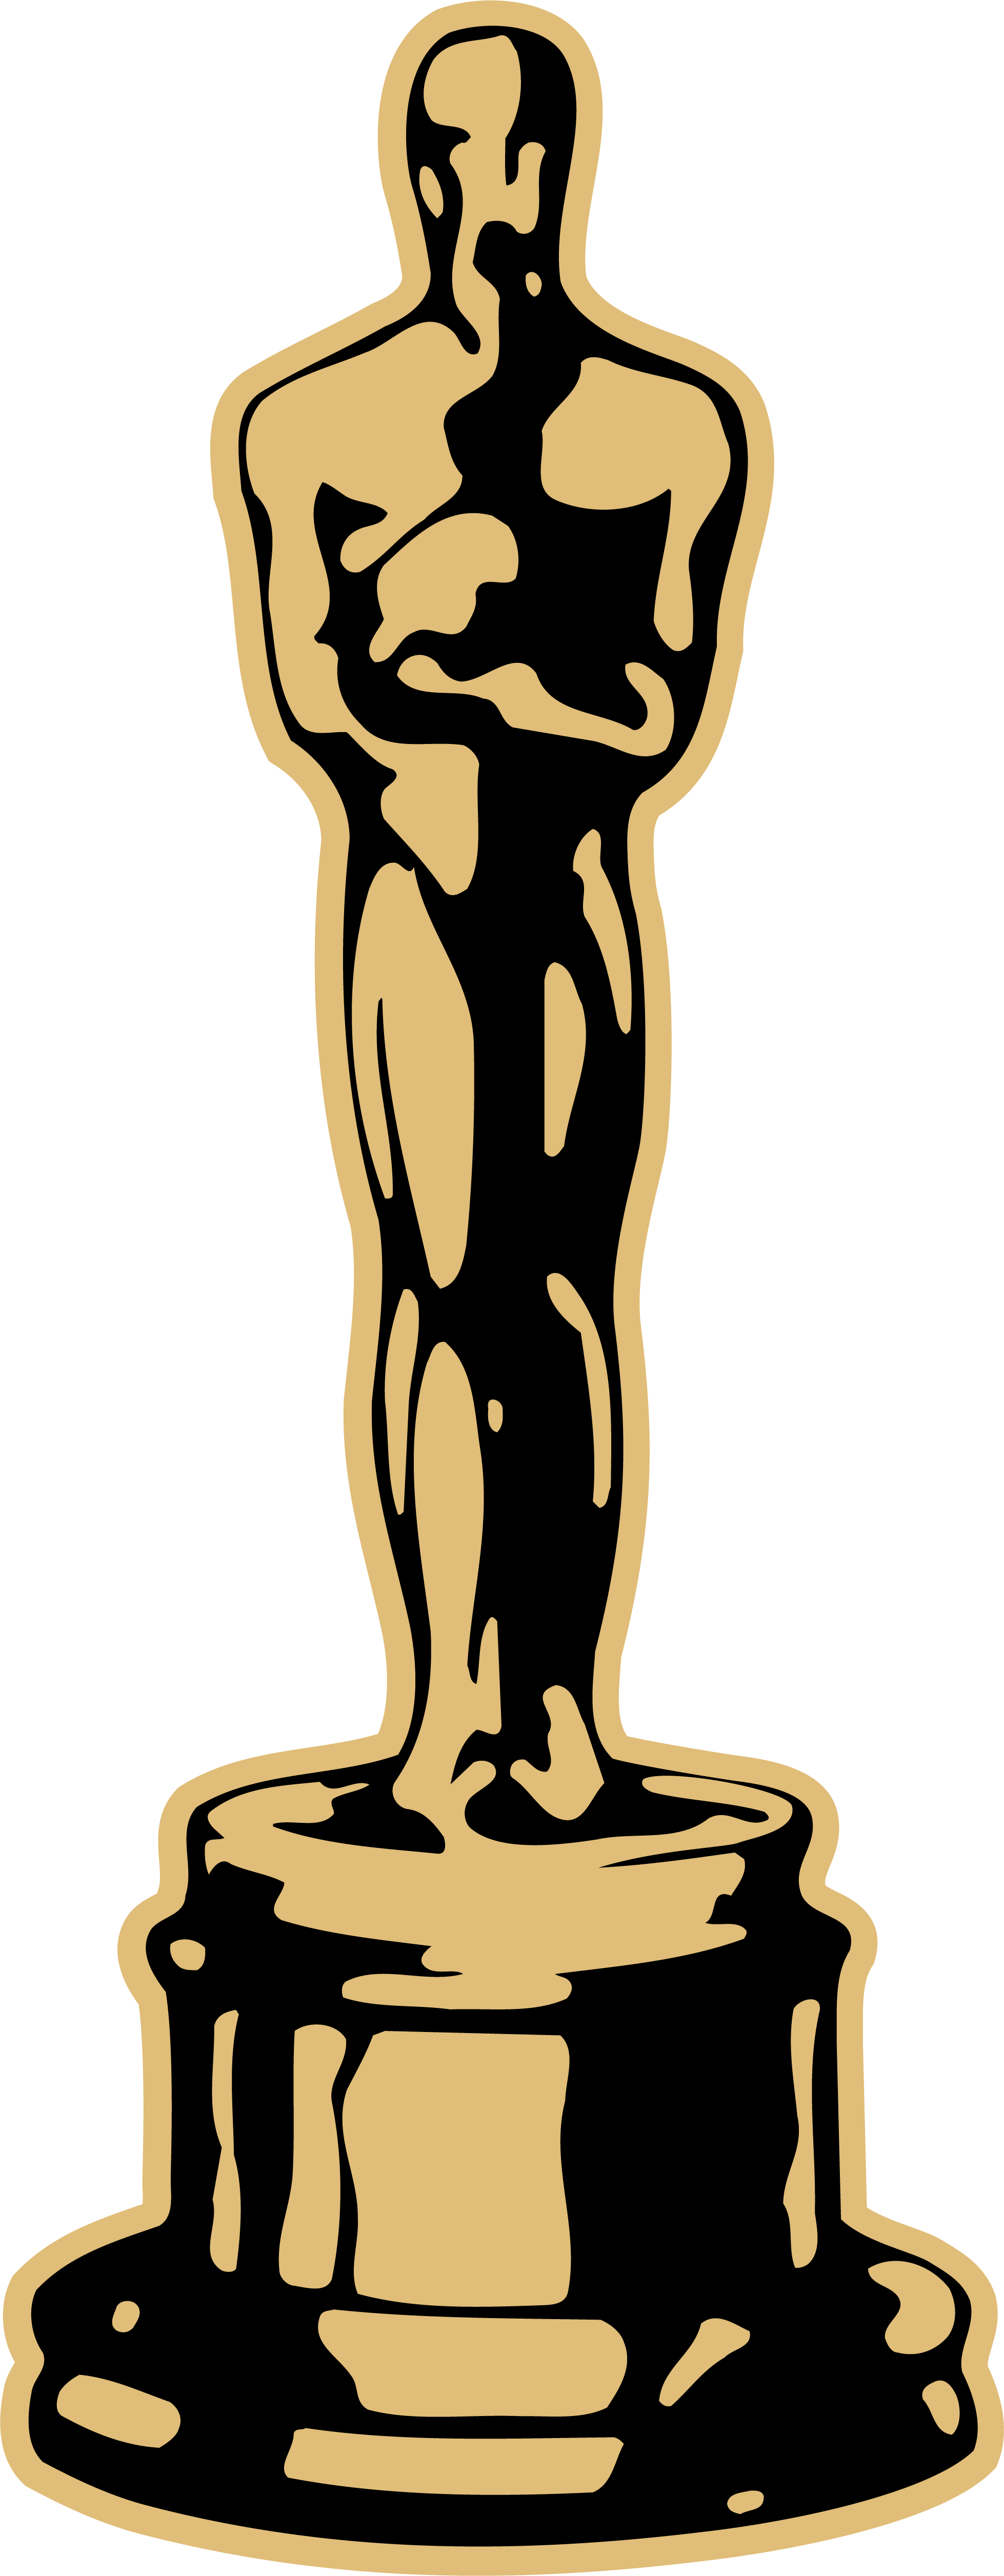 Oscar premios